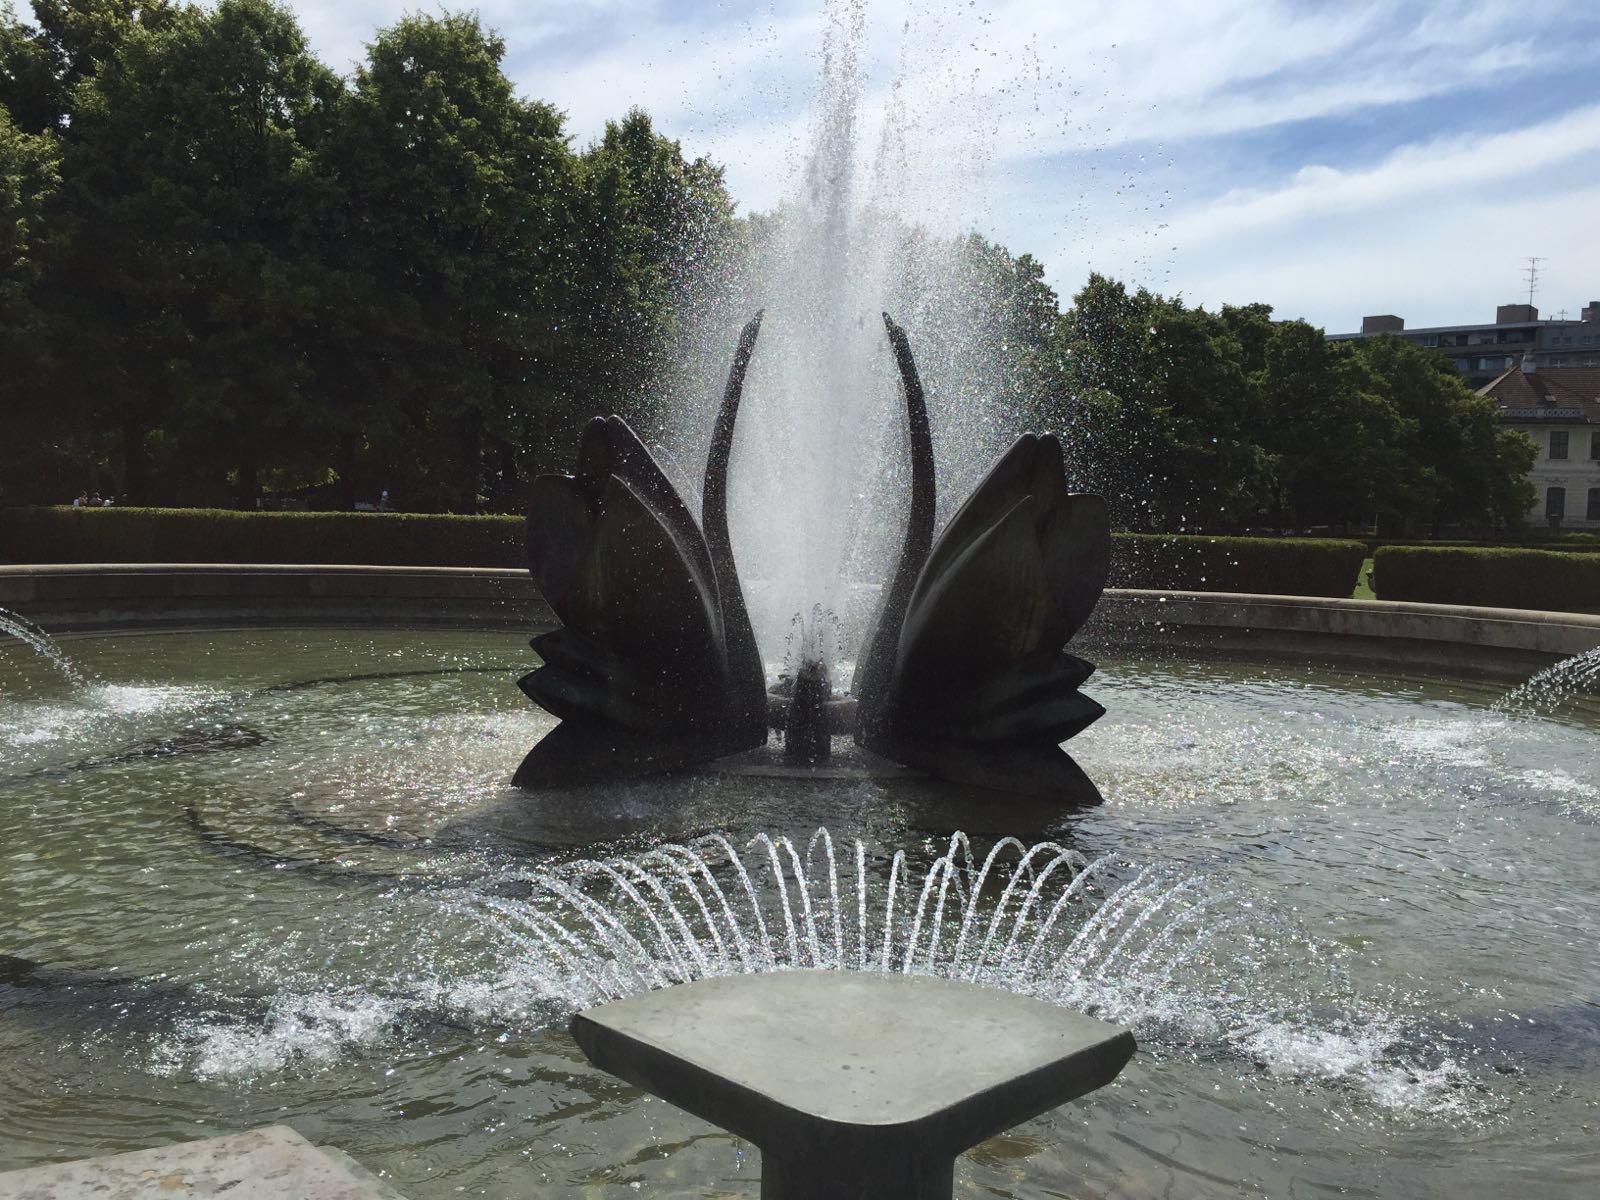 Technologia, Labutia fontana, Bratislava